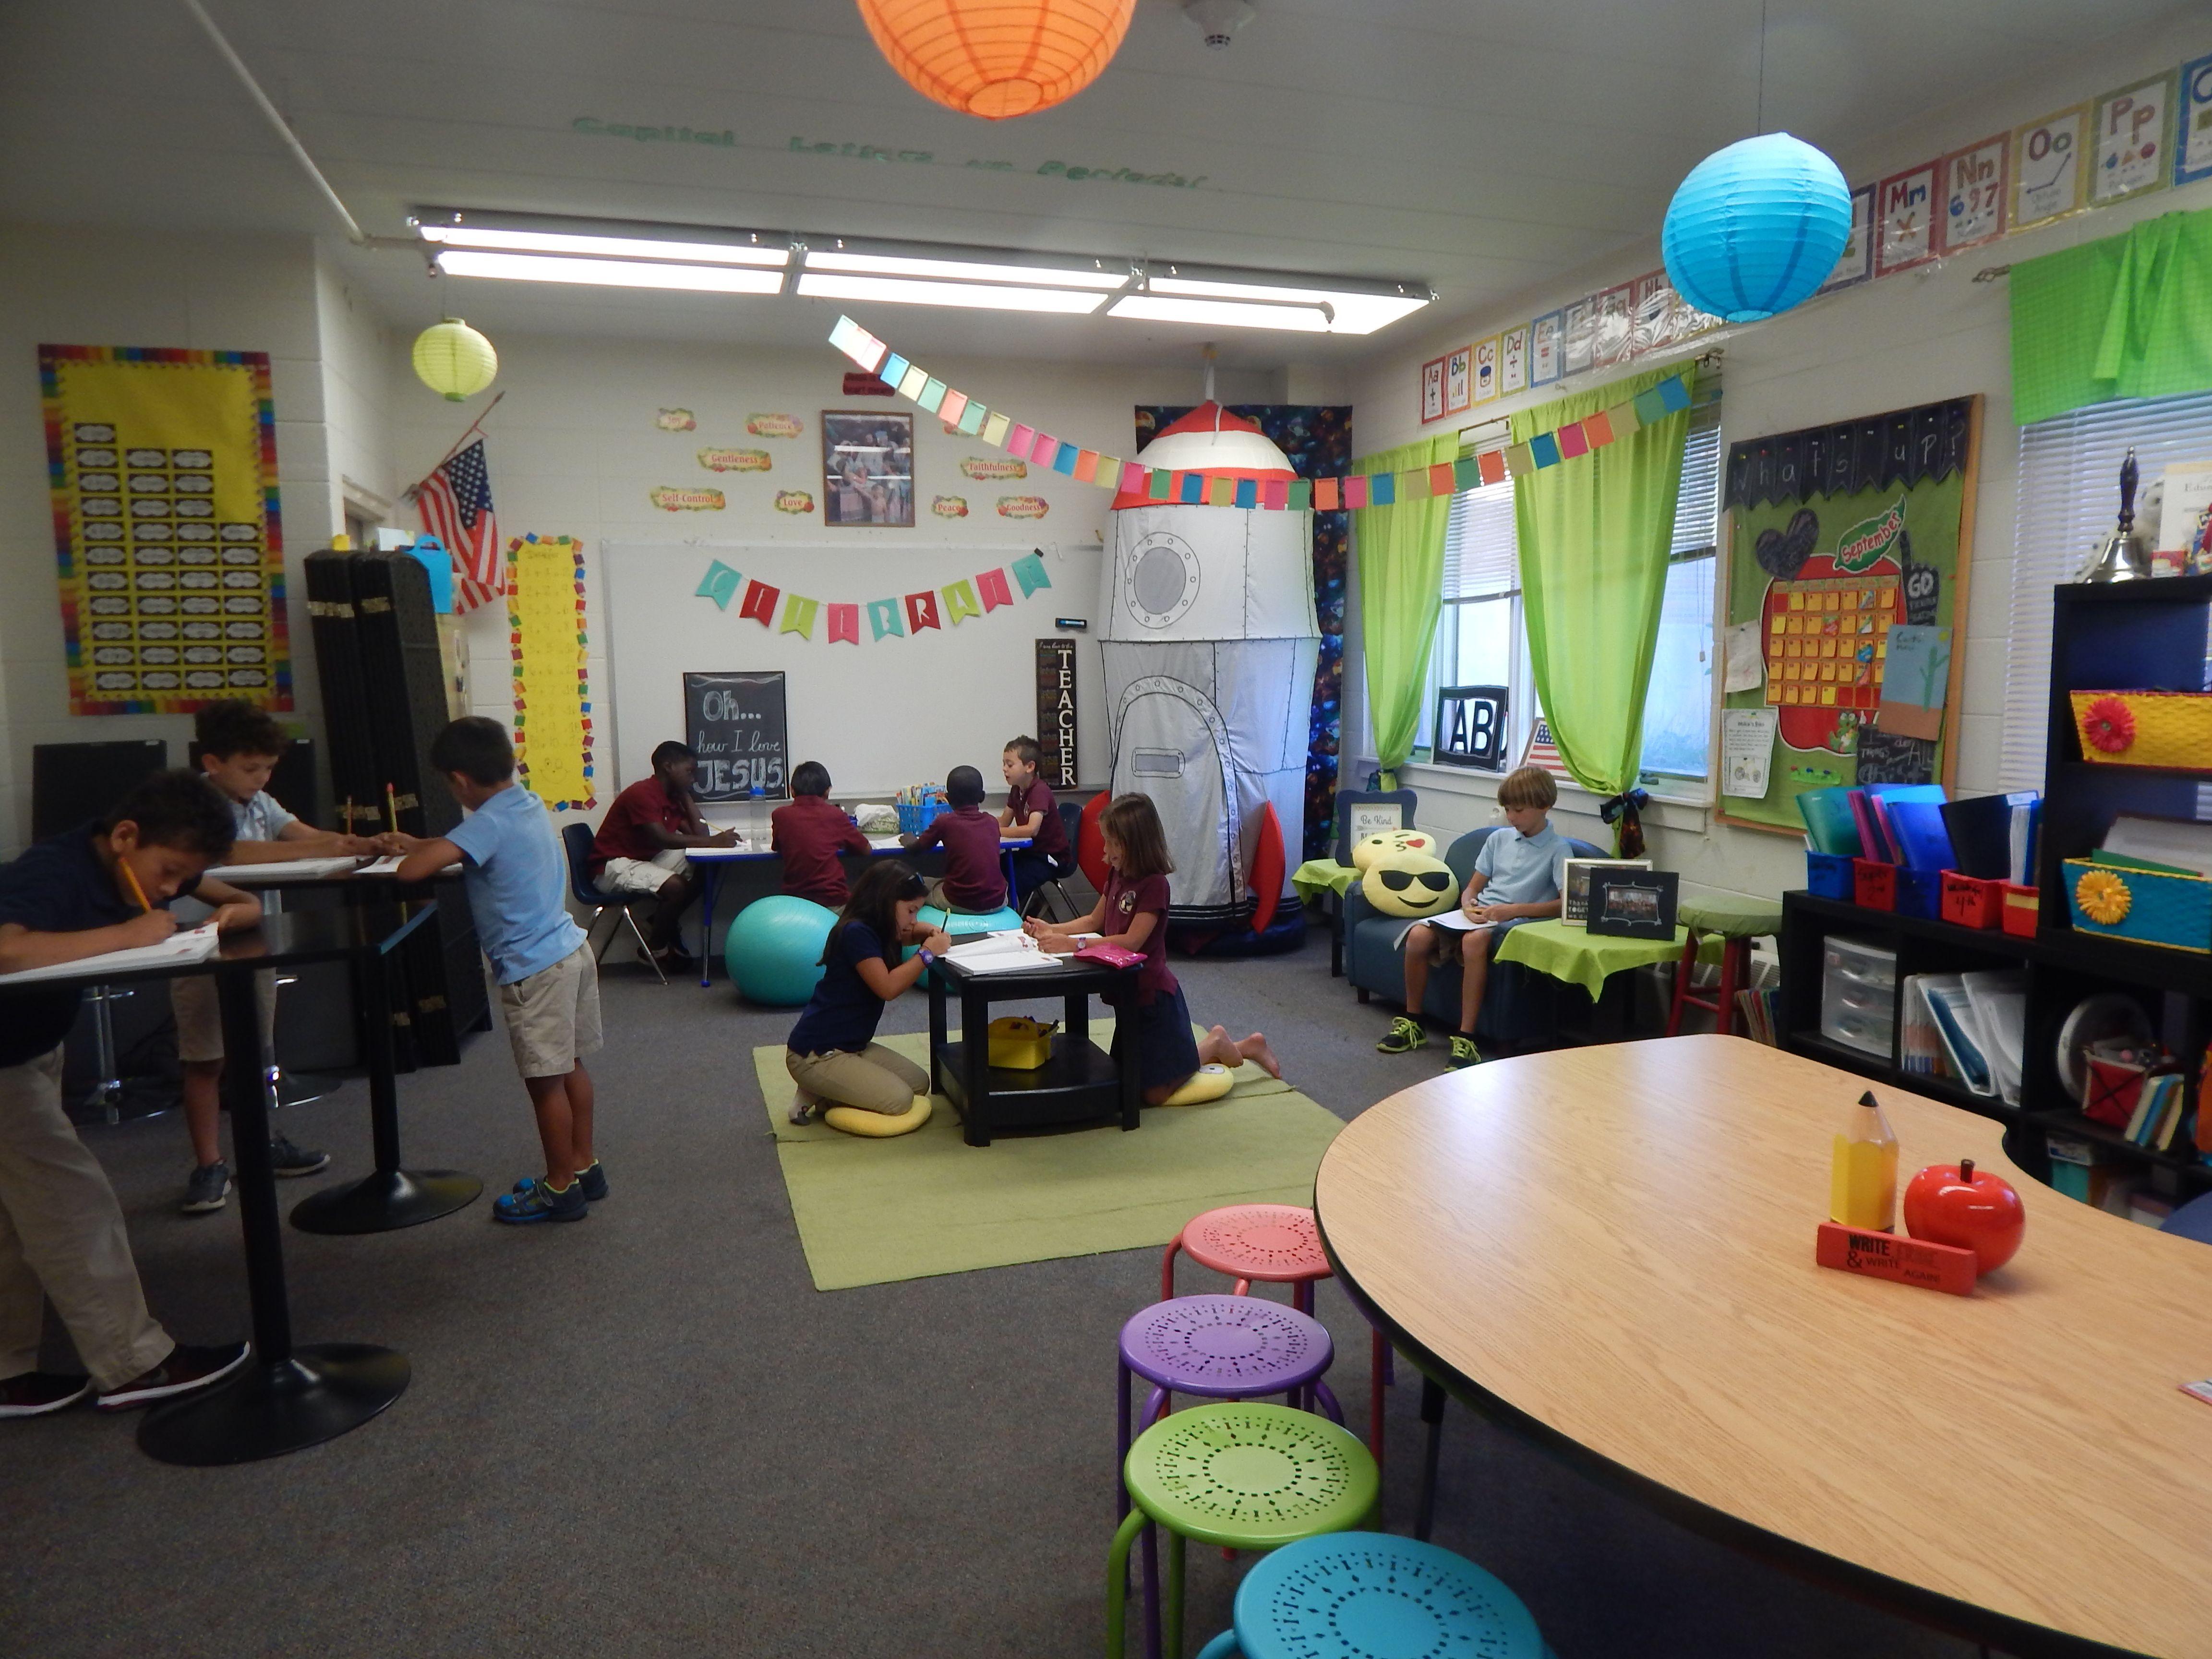 Kindergarten classroom table - Flexible Seating In Classrooms Standing In The Classroom Kneeling Lying Down Bouncing